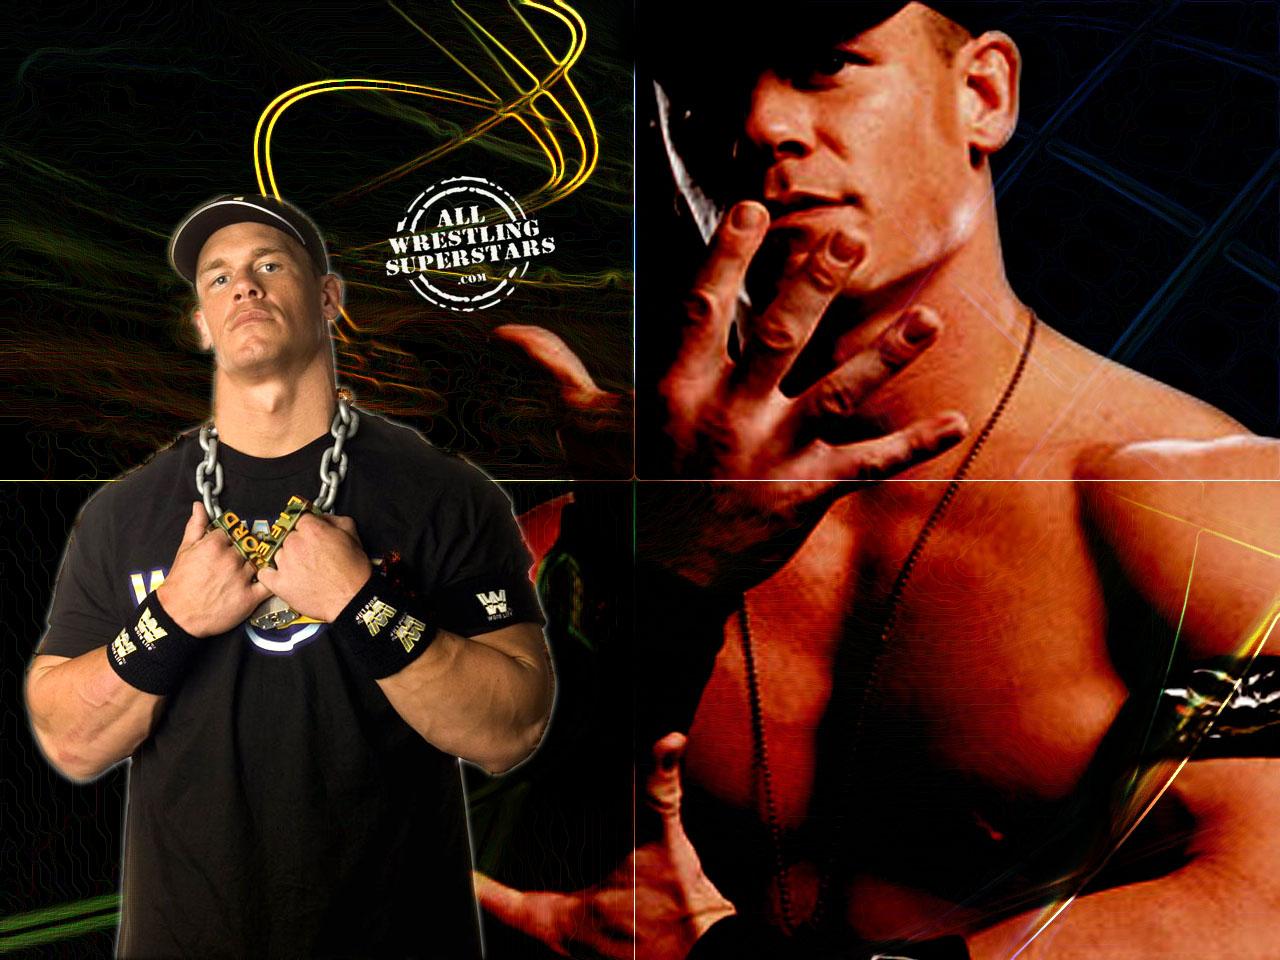 Wwe Chain Gang Soldier John Cena Wallpaper